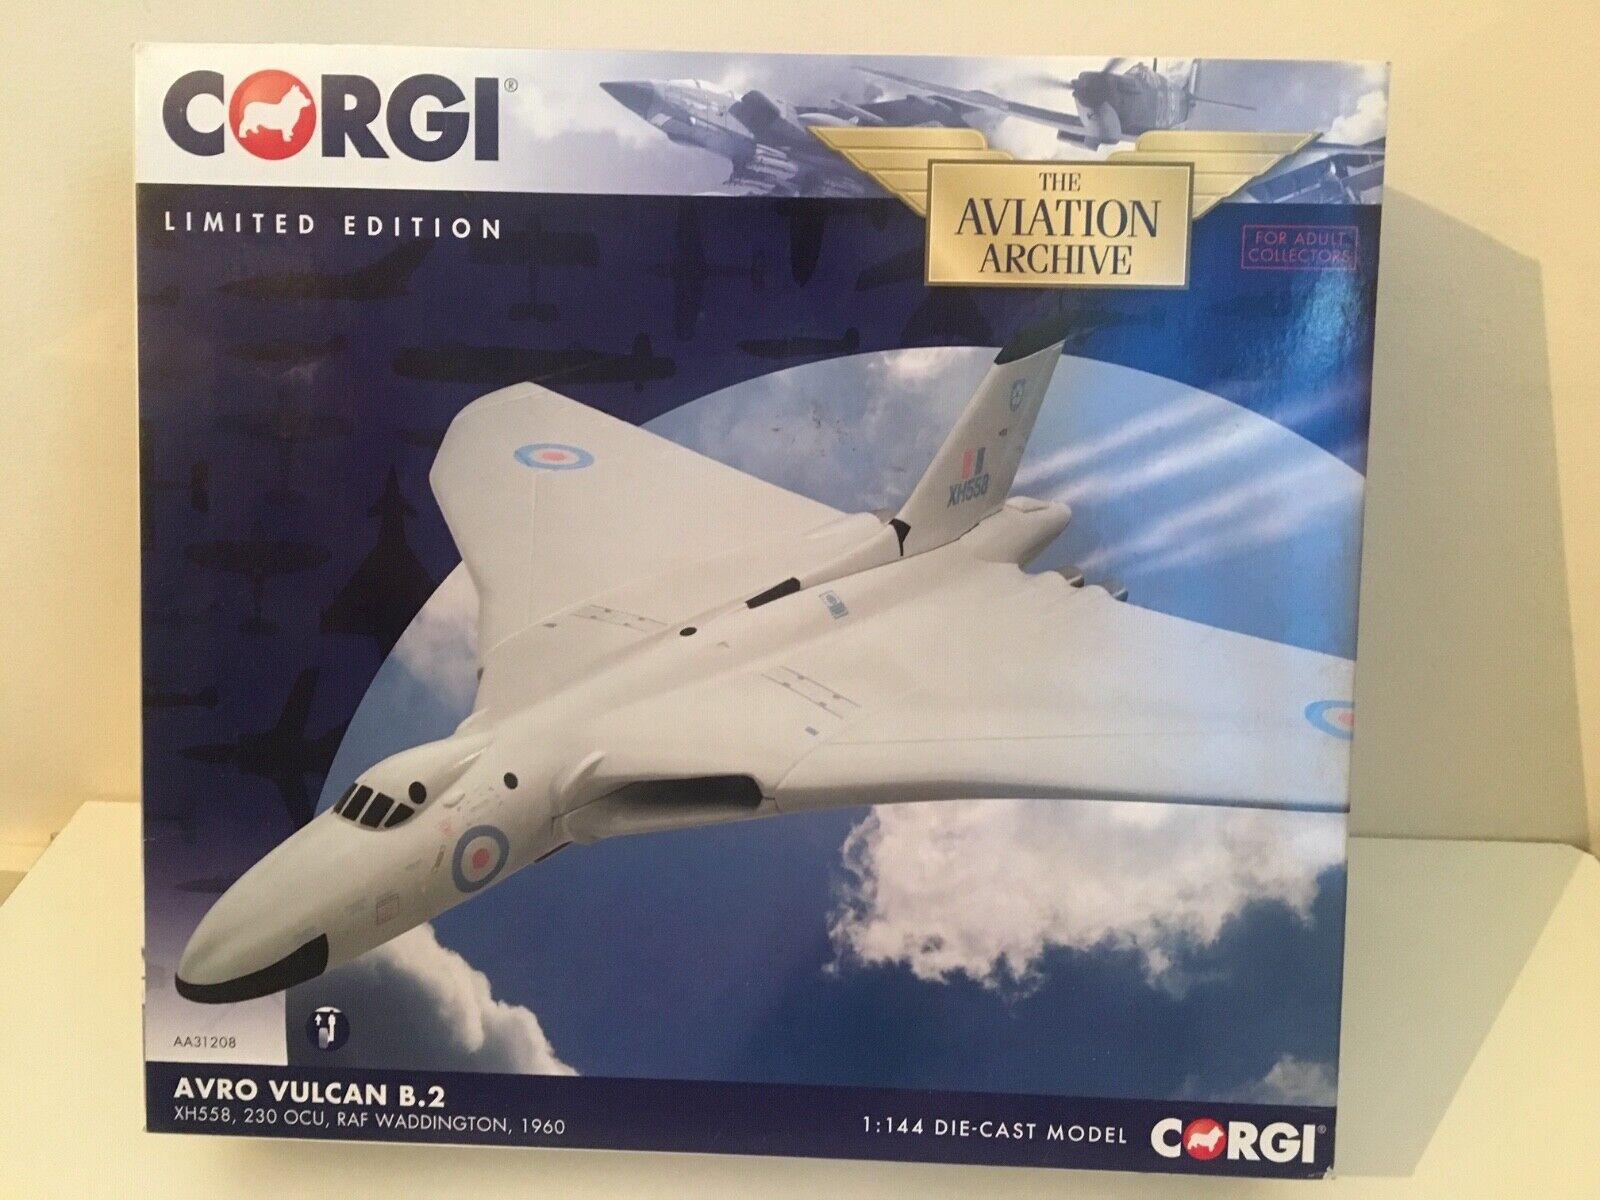 1 144 Corgi AA31208 - Avro Vulcan B.2 XH558, RAF Waddington 1960